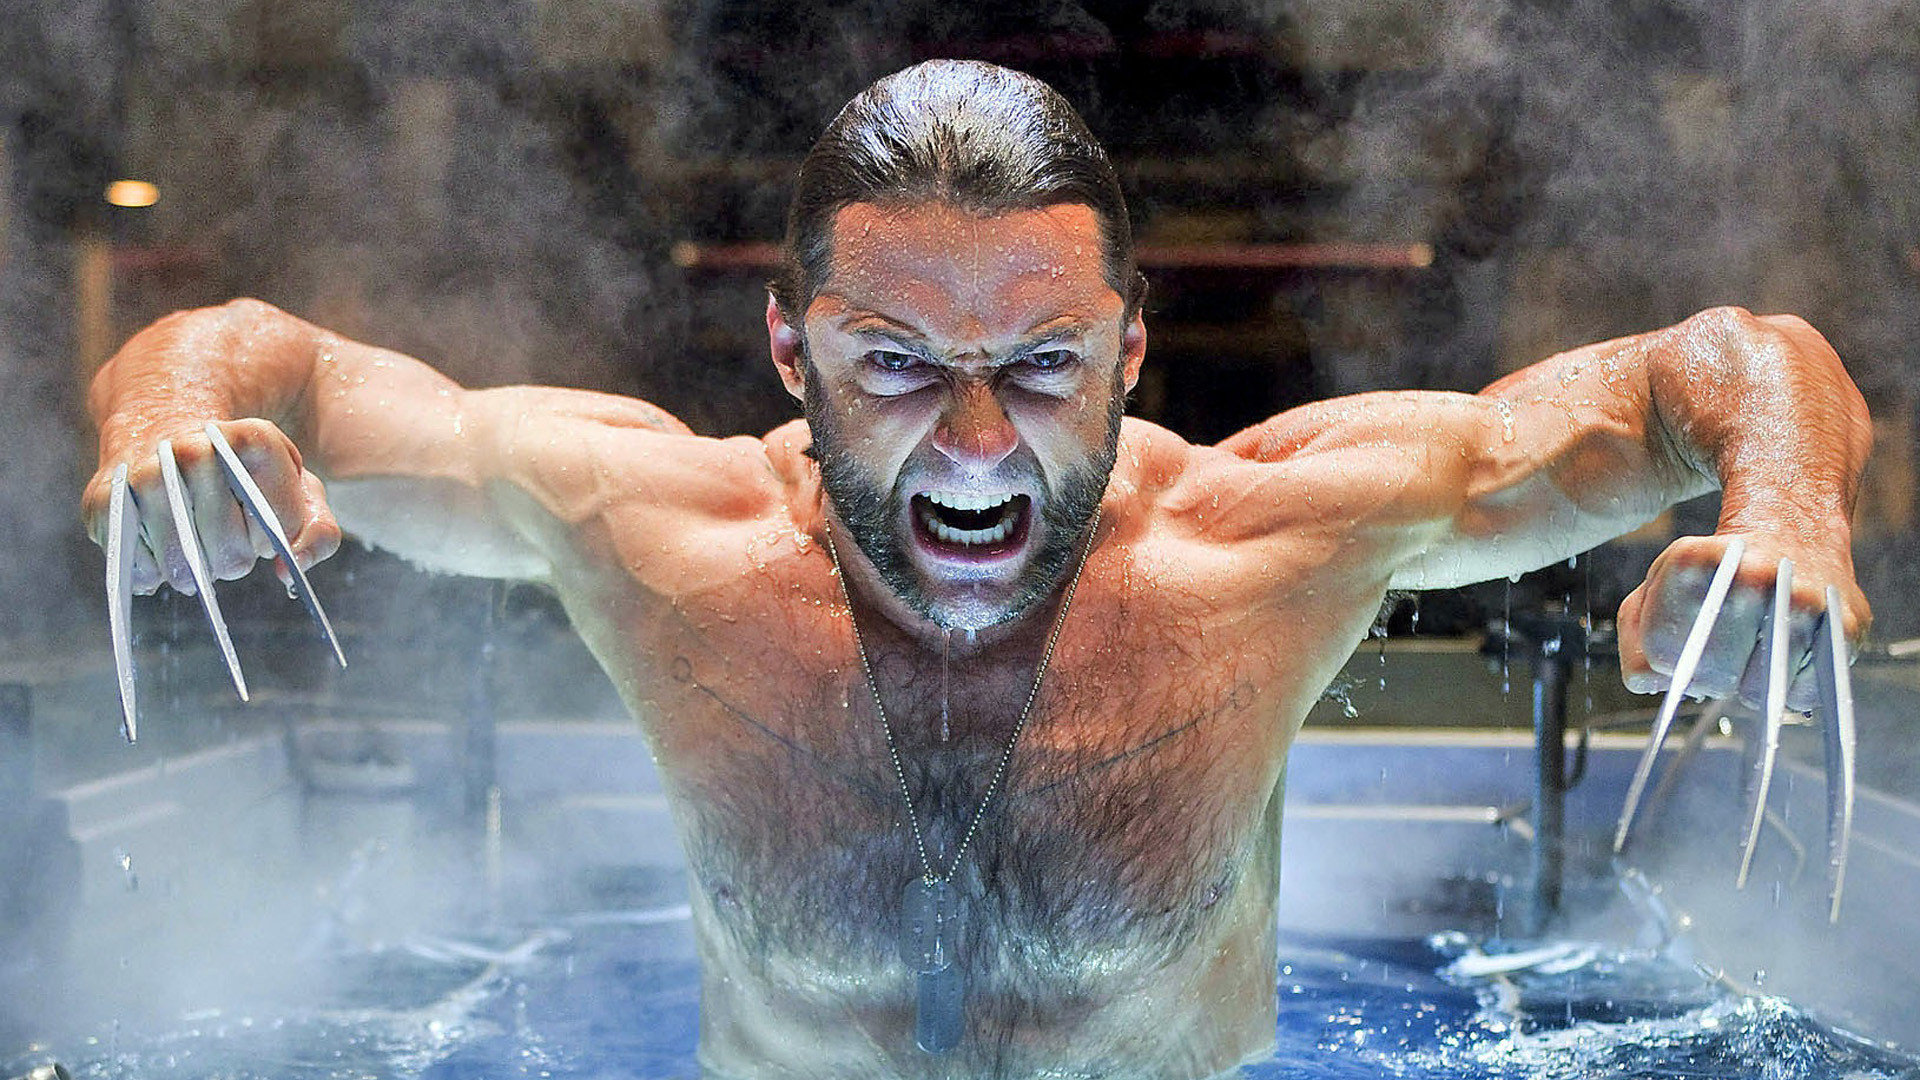 X Men Origins Wolverine Wallpapers 1920x1080 Full Hd 1080p